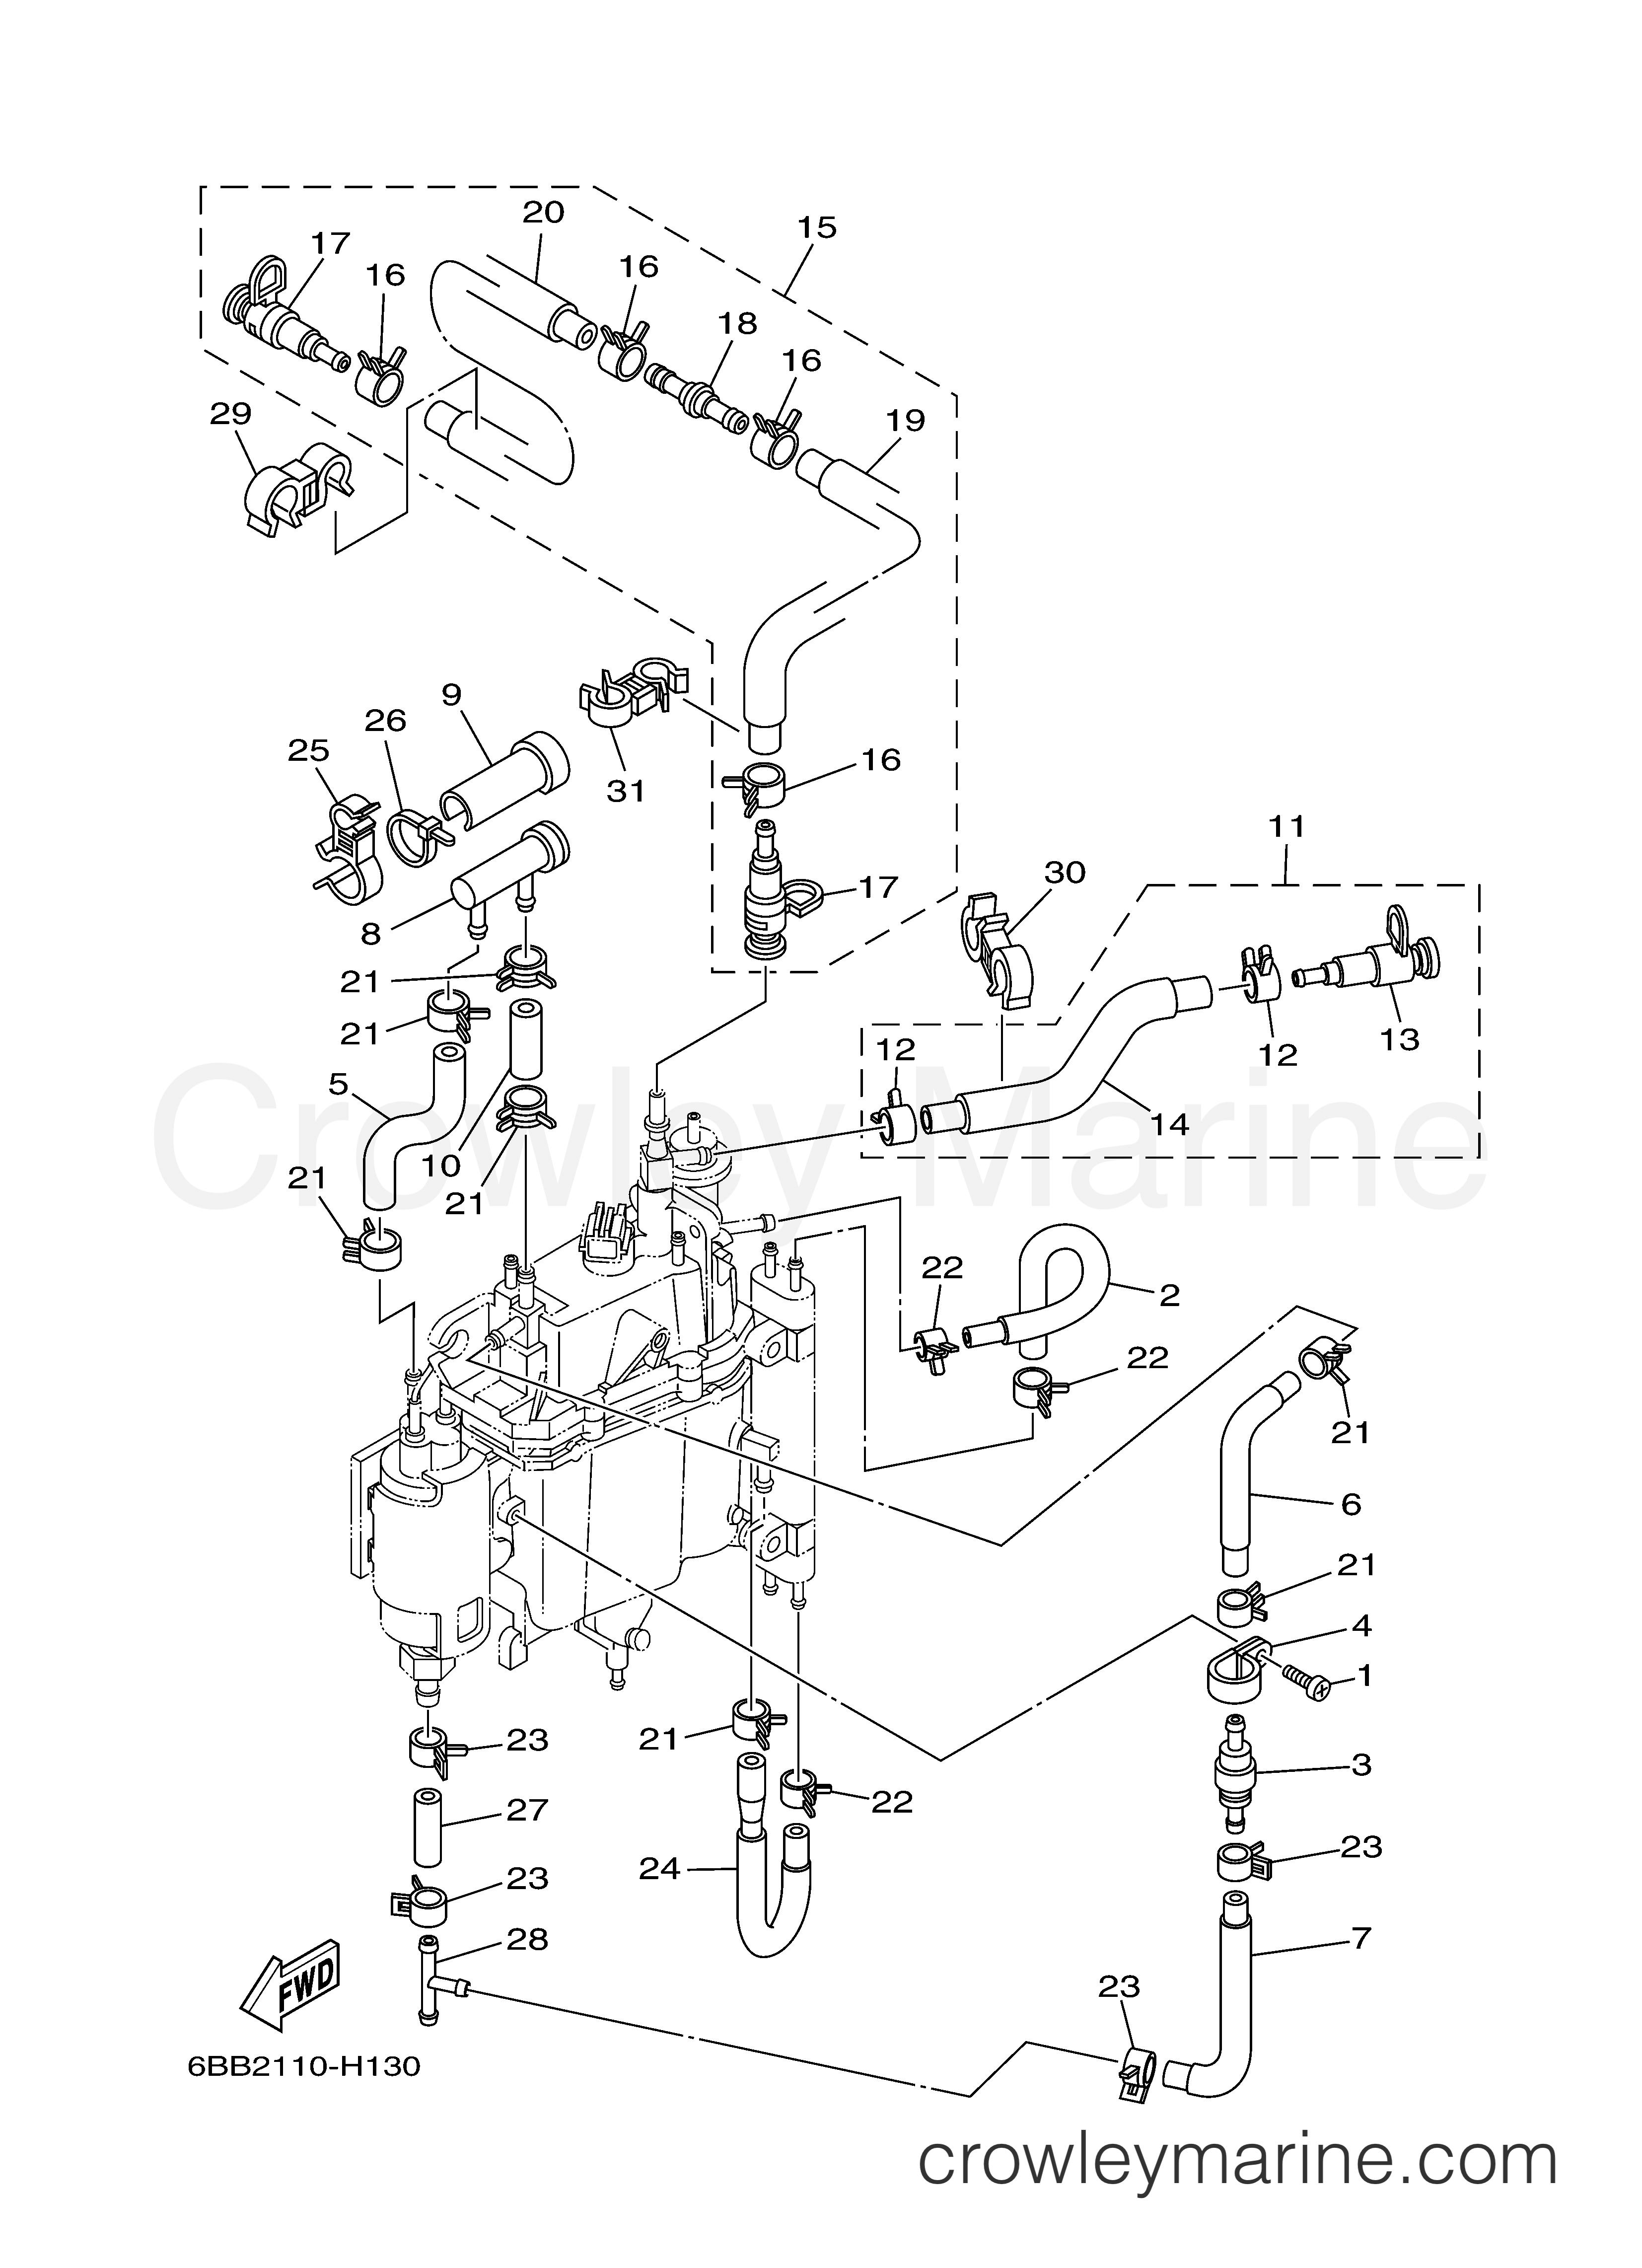 FUEL INJECTION PUMP 2 - 2008 Yamaha Outboard 250hp LF250TXR